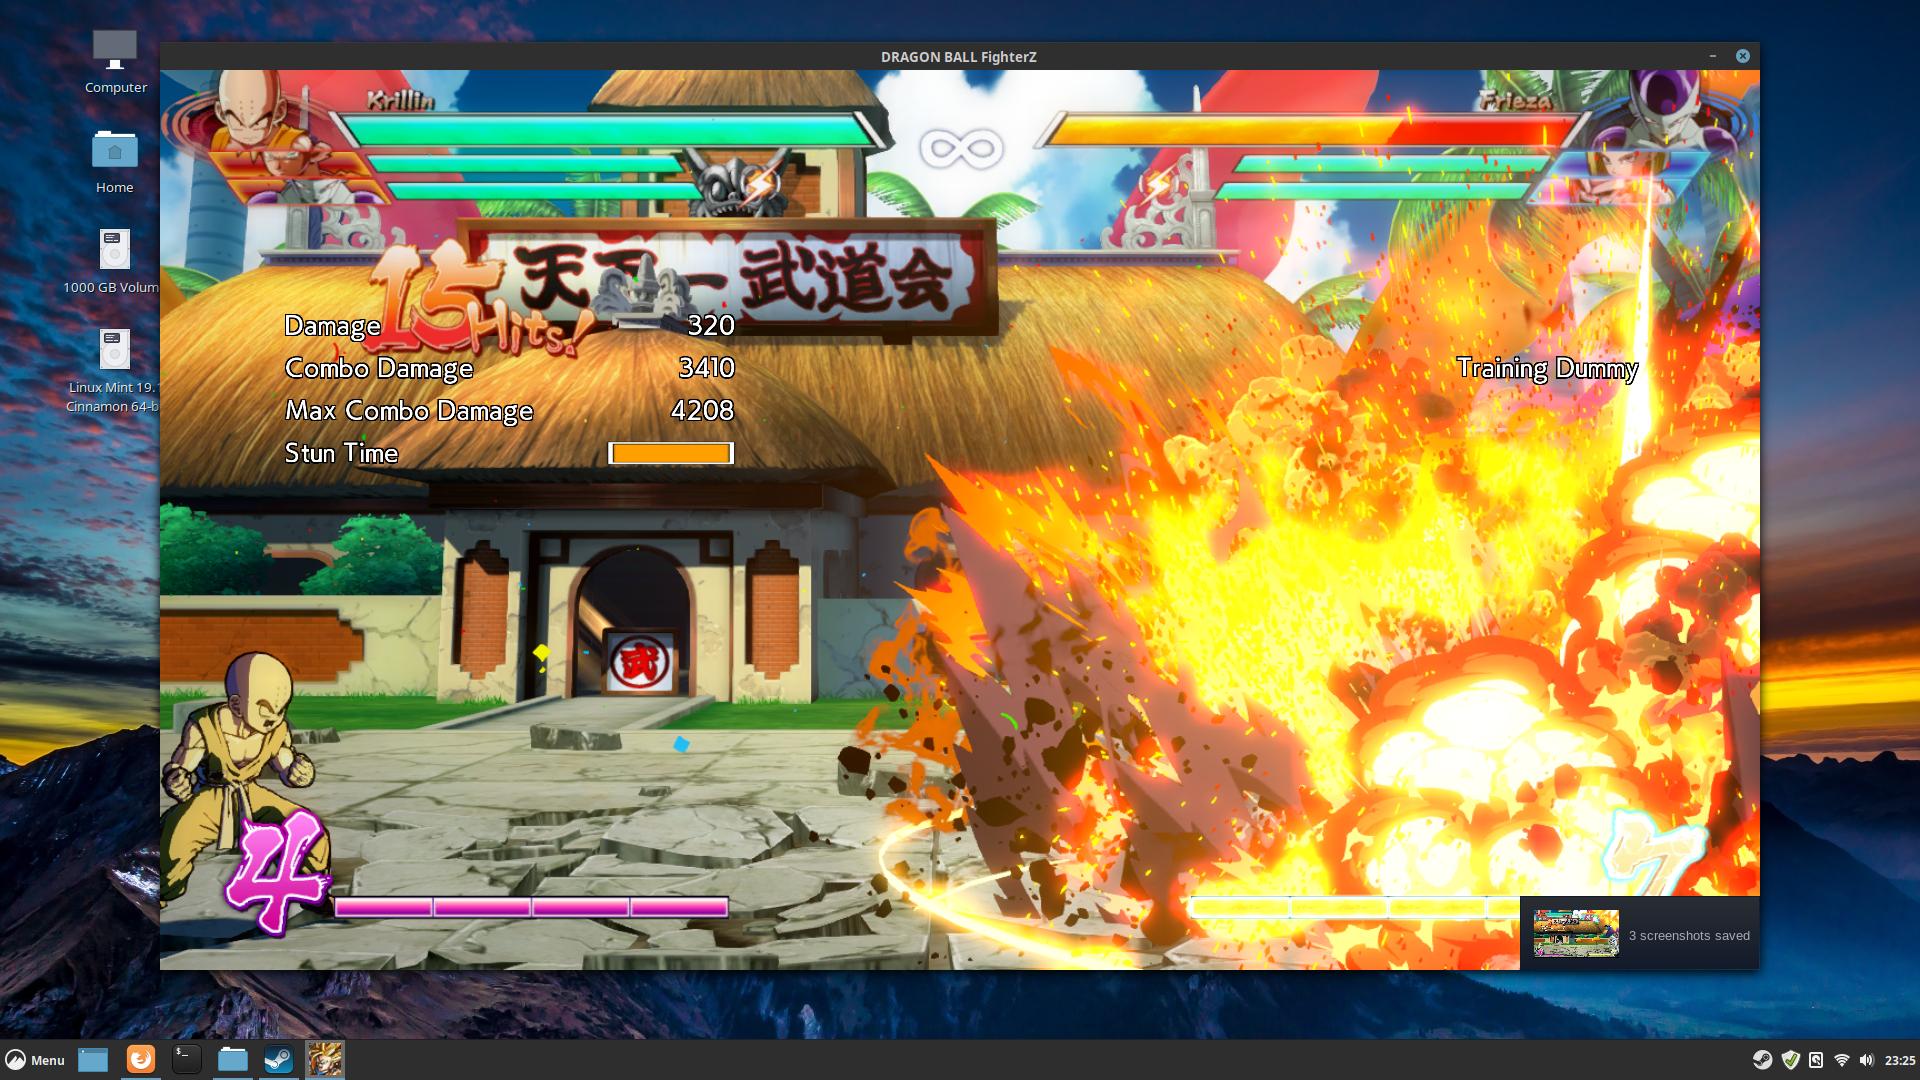 Dragonball fighterz (678950) · Issue #1240 · ValveSoftware